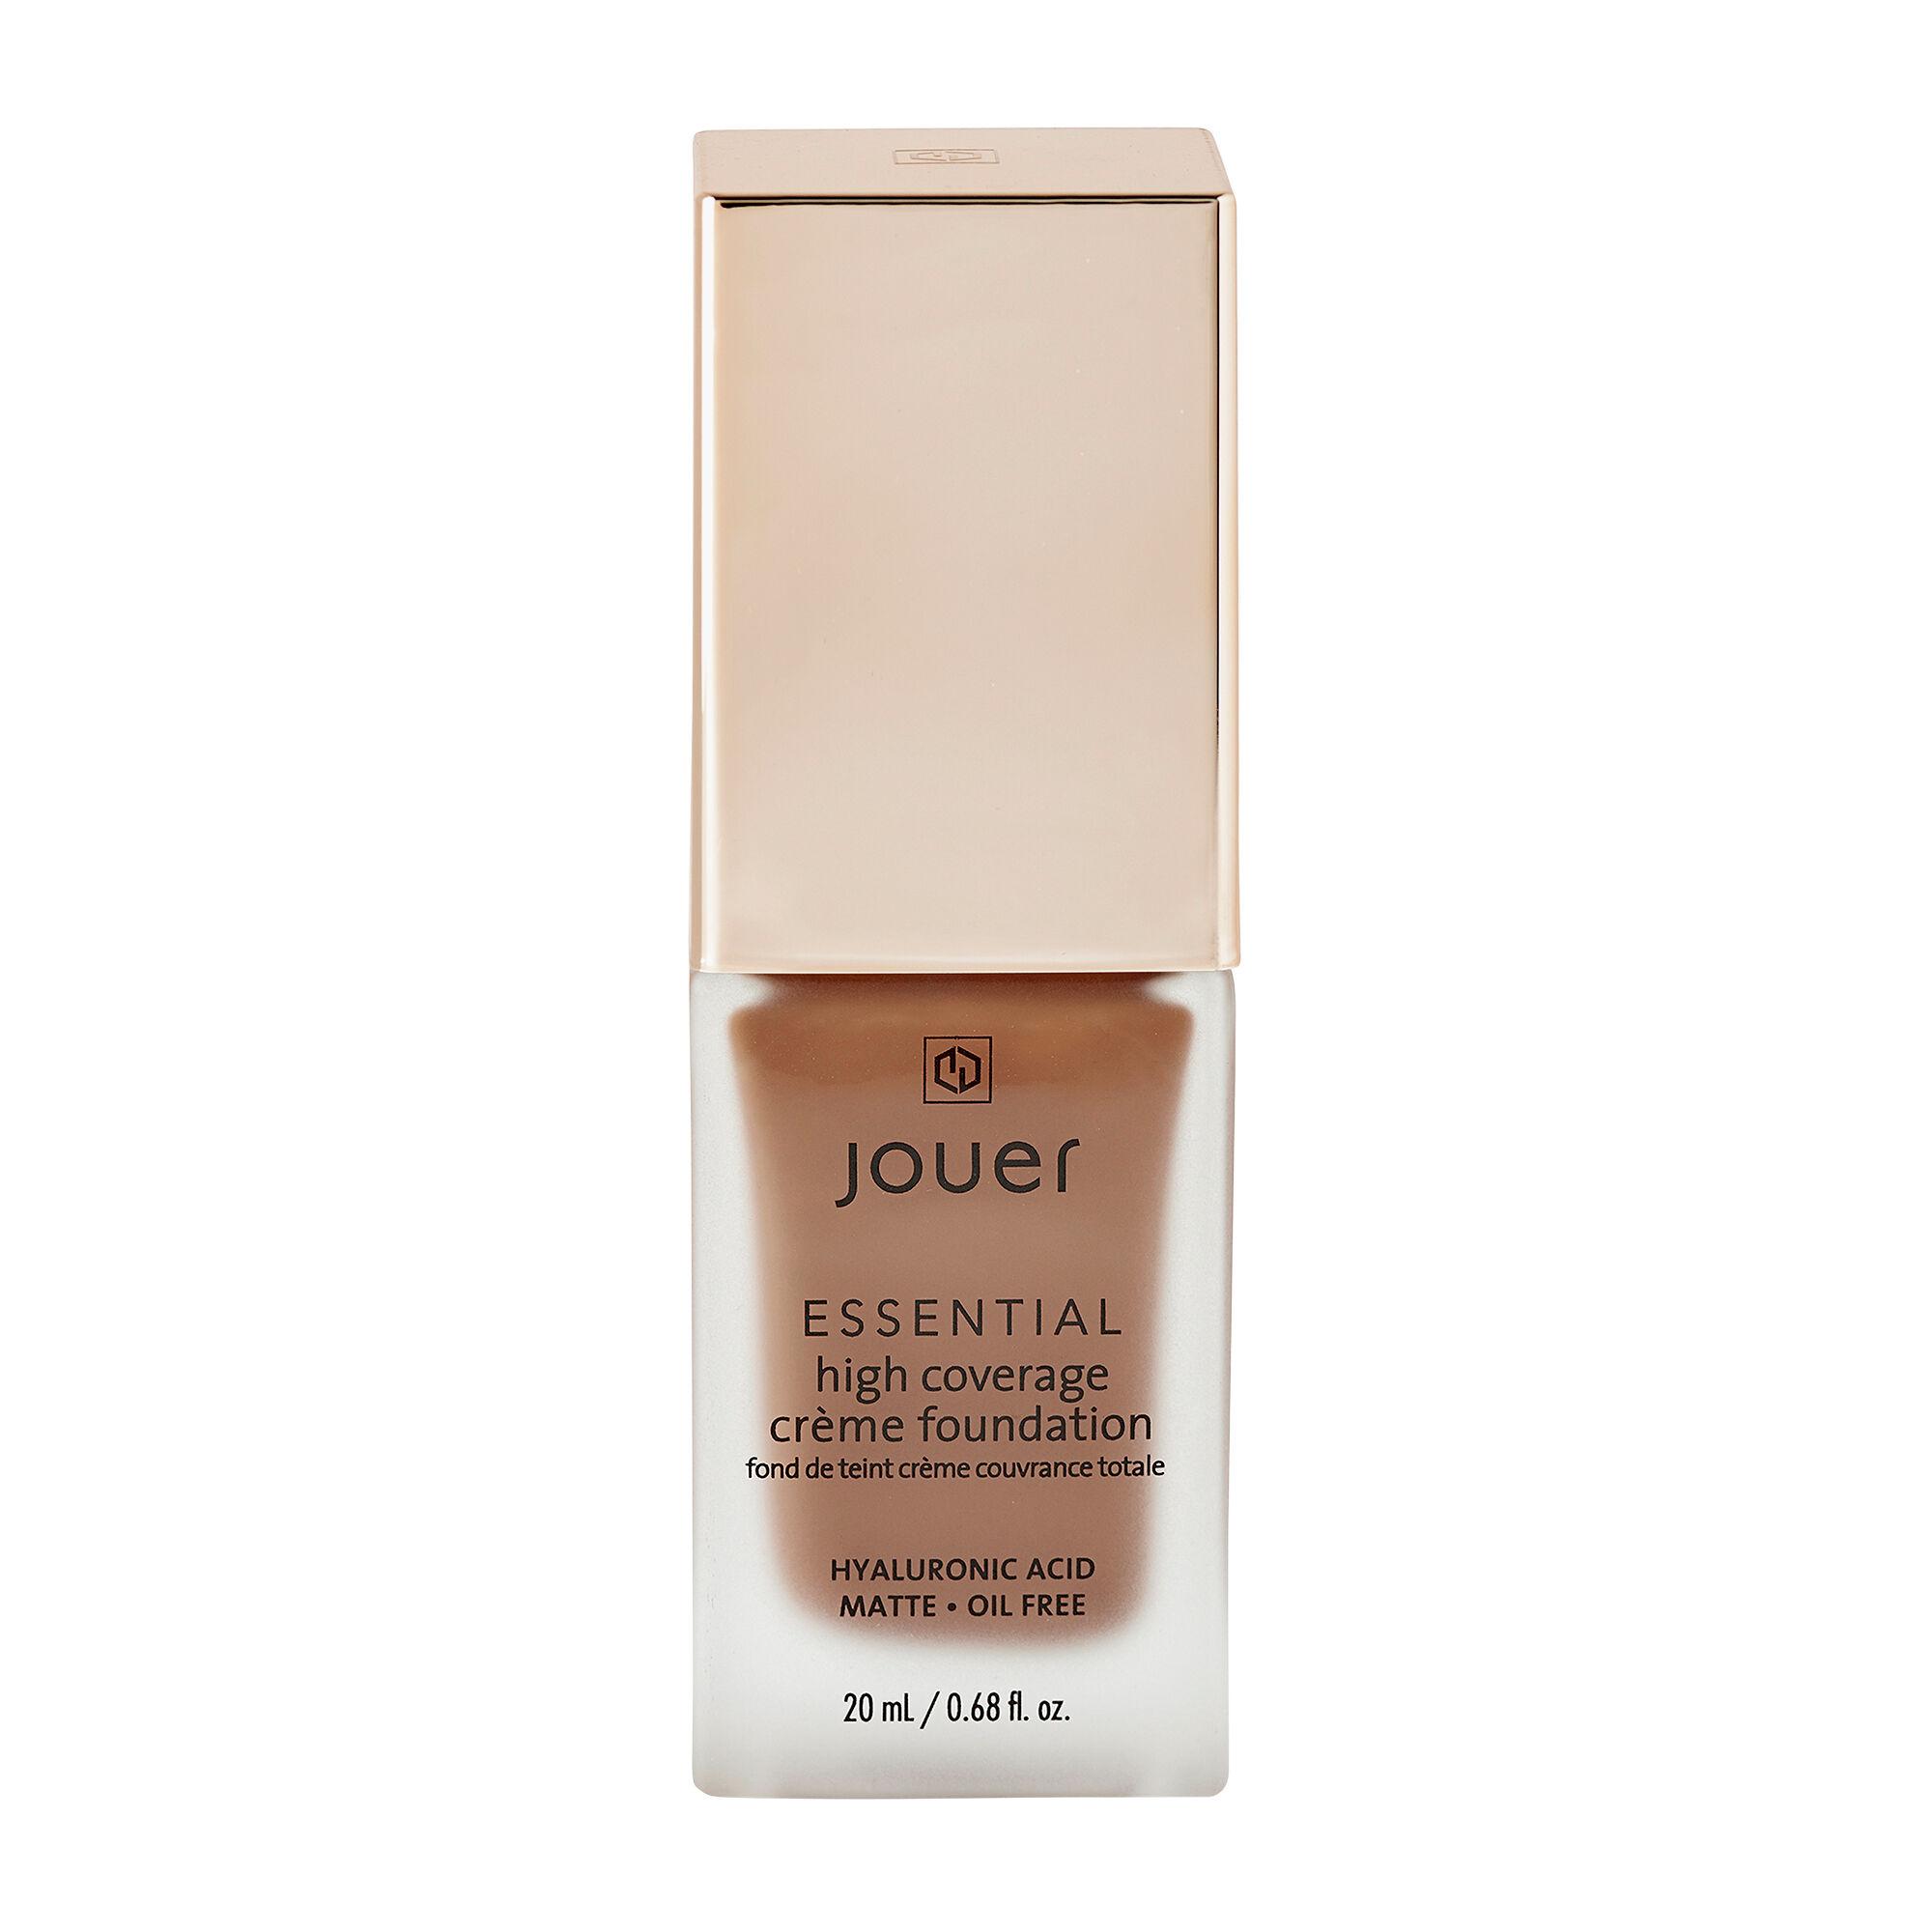 Jouer Cosmetics Essential High Coverage Creme Foundation Chestnut 20ml